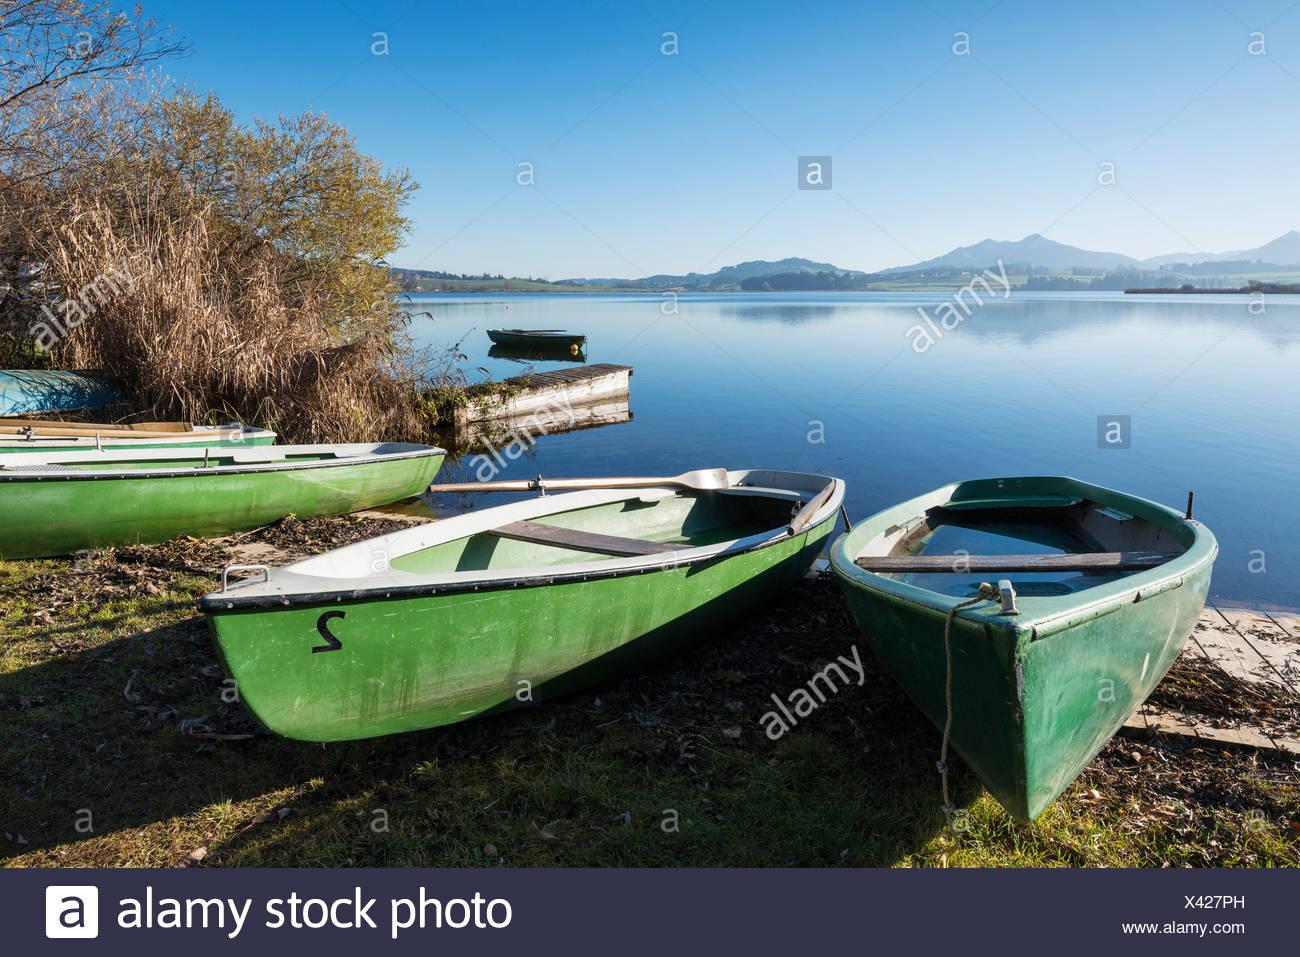 Rowing boats on the shore of Hopfensee Lake near Fuessen, Ostallgaeu region, Allgaeu, Bavaria - Stock Image